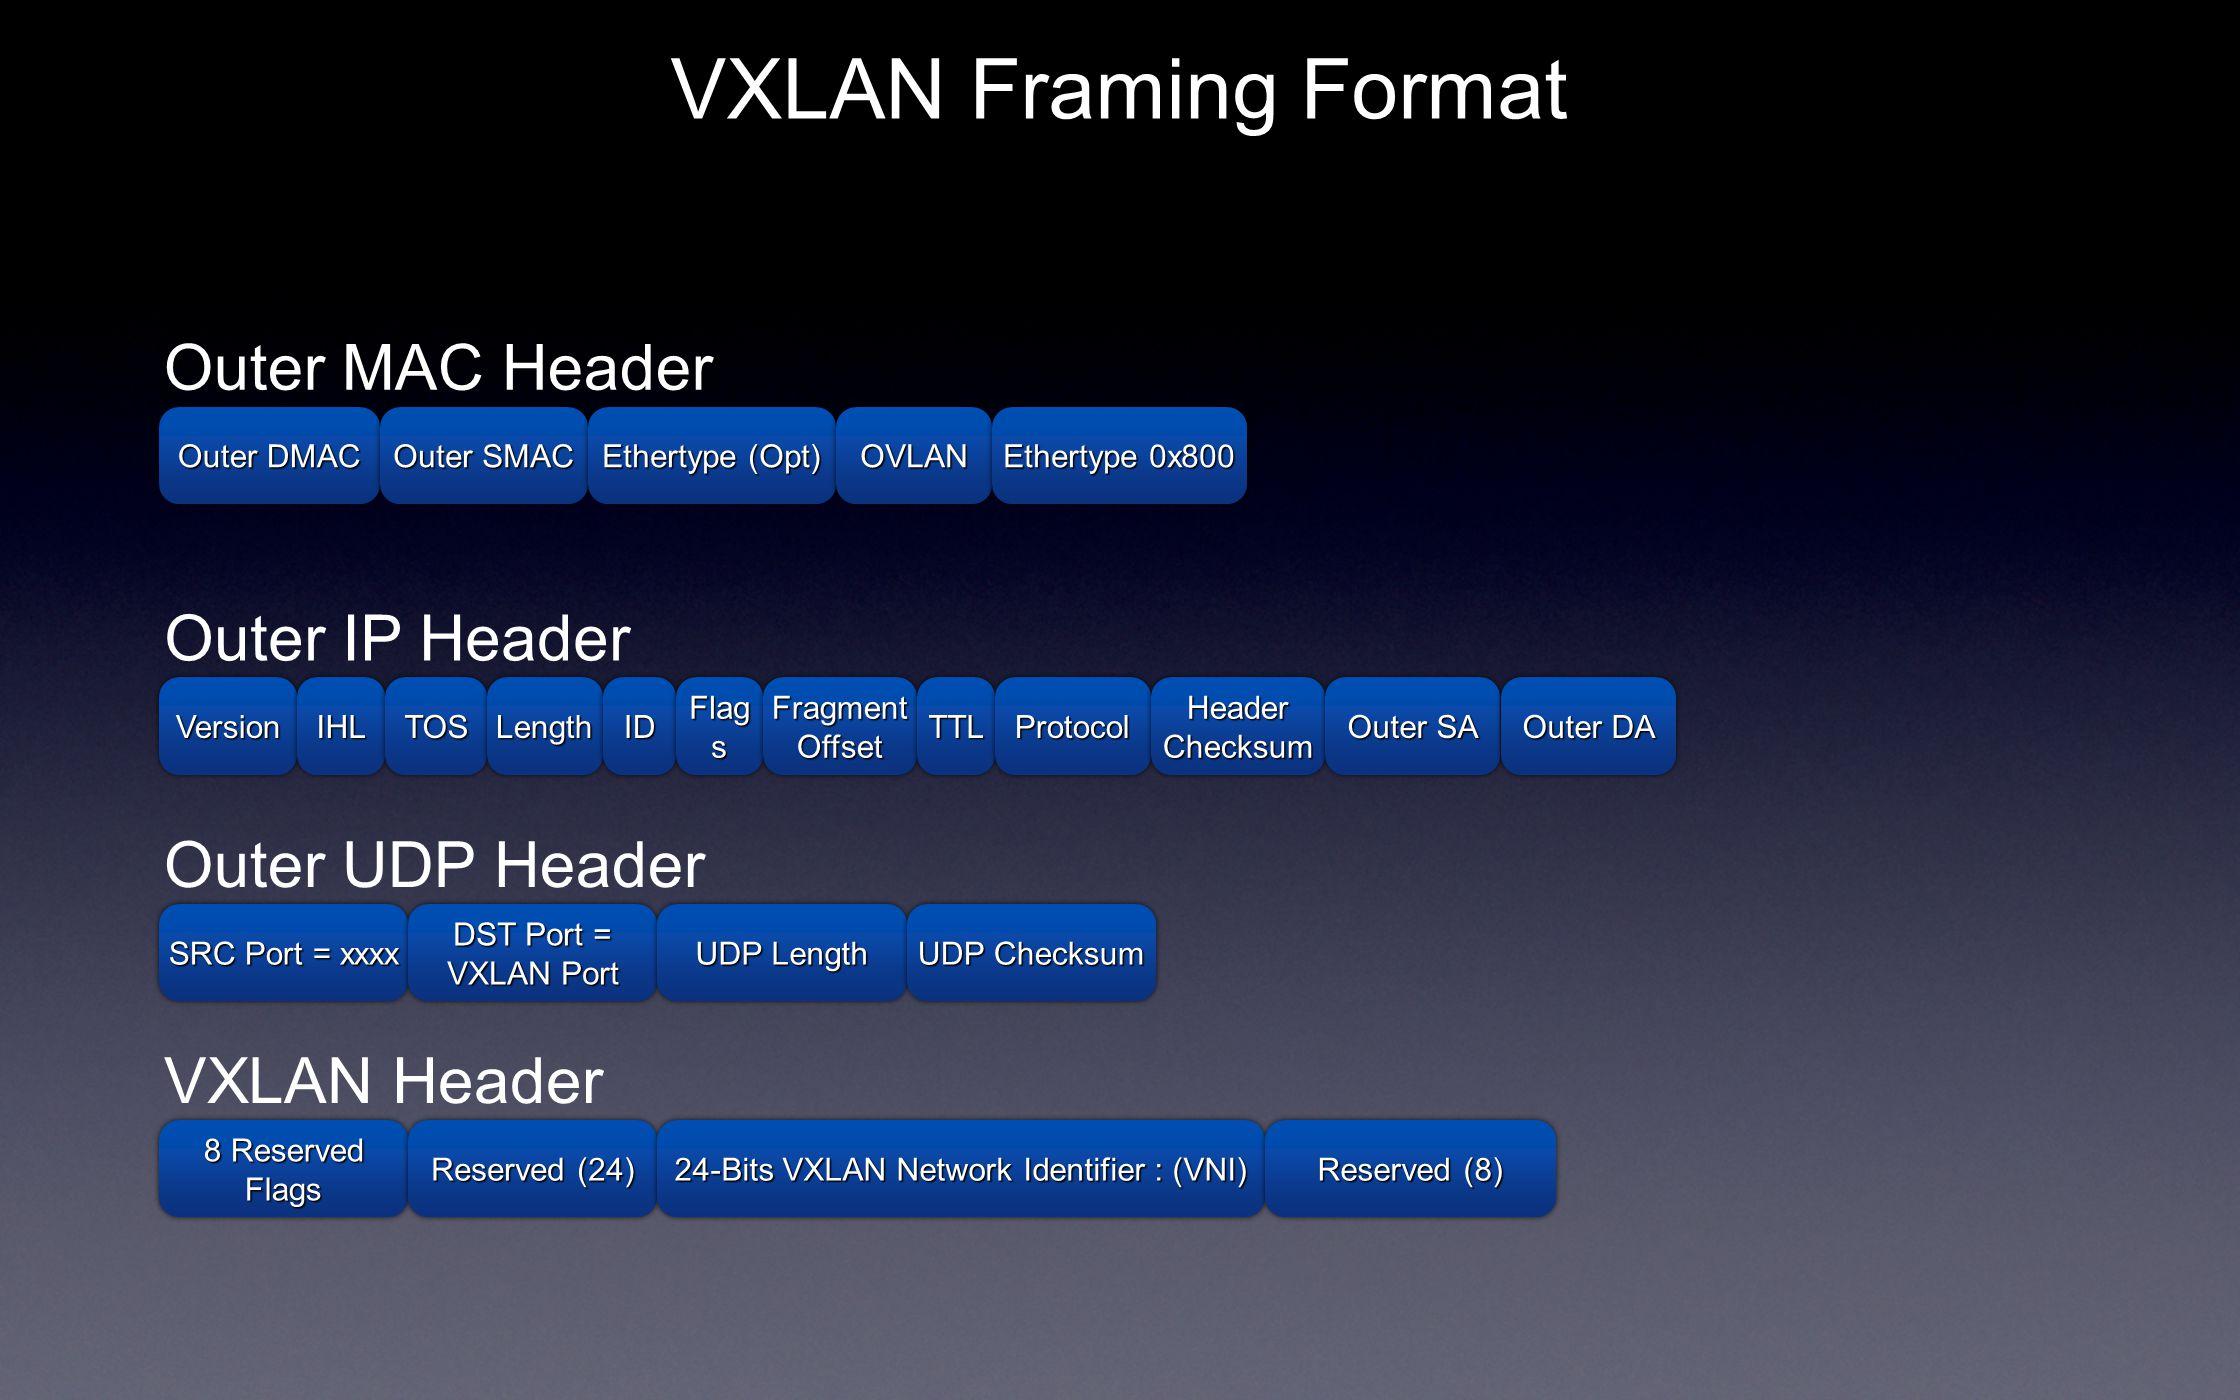 VXLAN Framing Format Outer DMAC Outer SMAC Ethertype (Opt) OVLANOVLAN Ethertype 0x800 Outer MAC Header VersionVersionIHLIHLTOSTOSLengthLengthIDID Oute